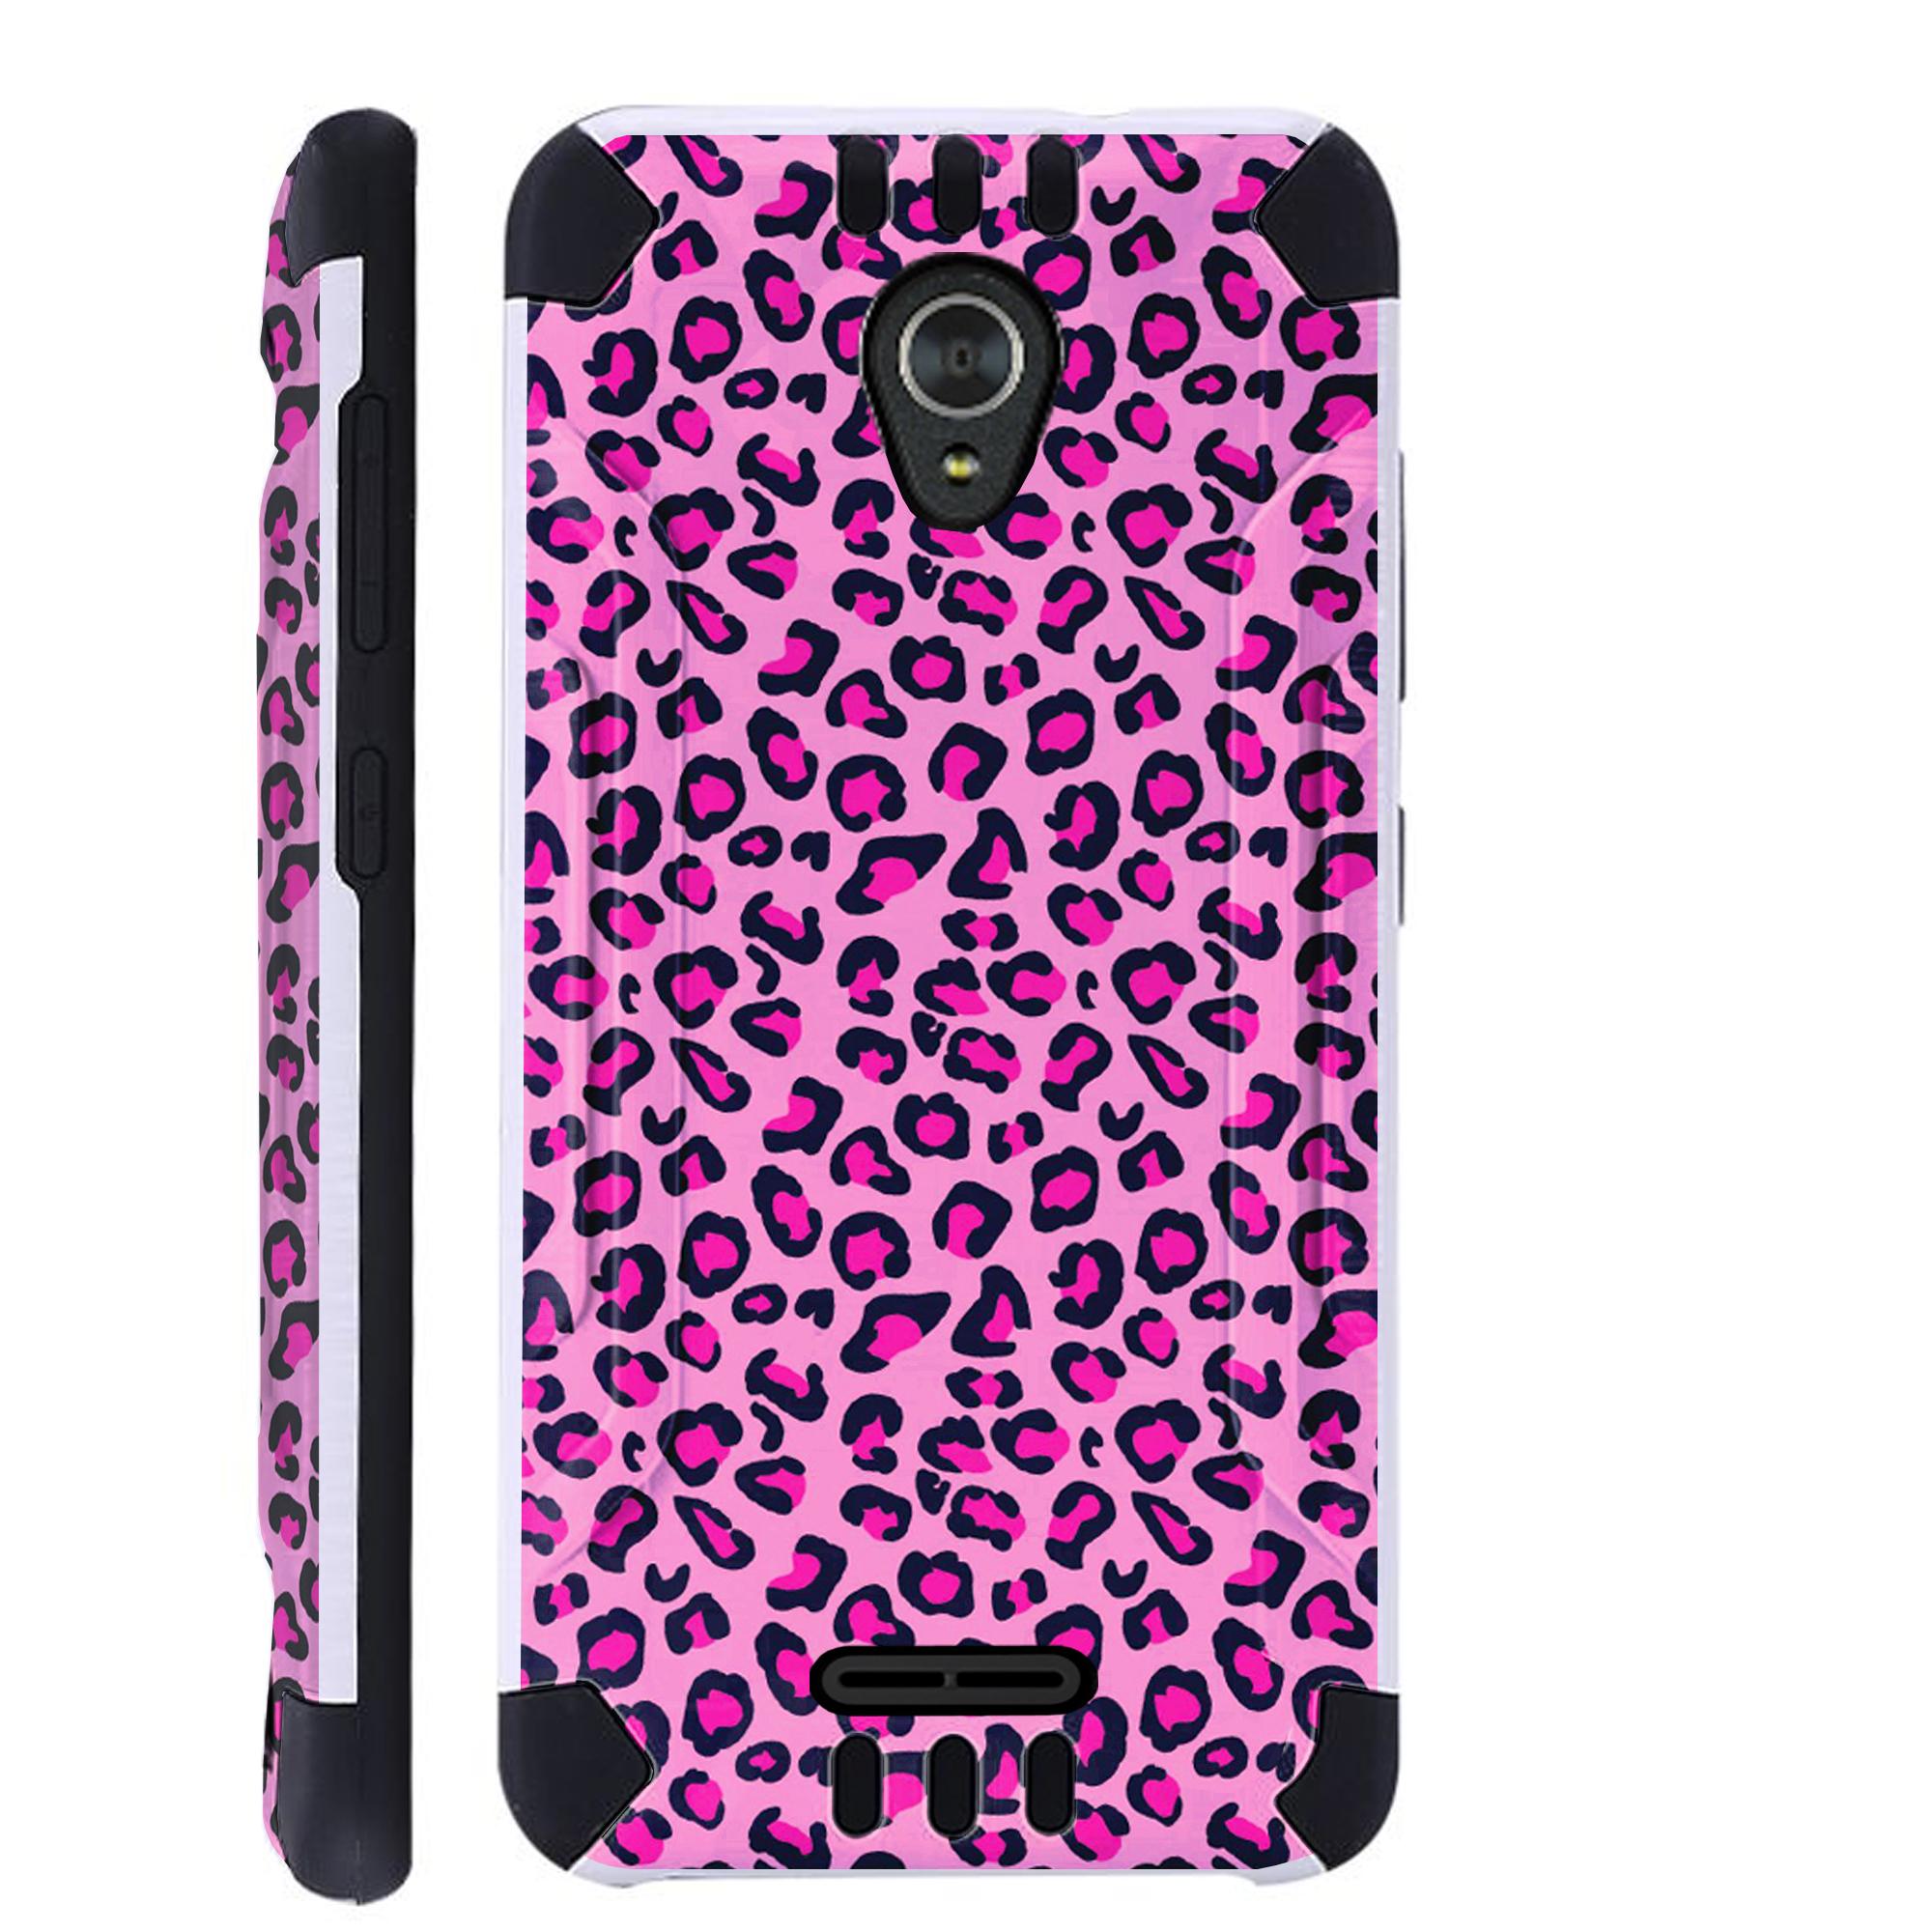 For Alcatel idealXCITE / Alcatel Verso / Alcatel Raven / Alcatel CameoX / Alcatel Fiji Case Brushed Metal Texture Hybrid TPU KombatGuard Phone Cover (Pink Leopard Skin)